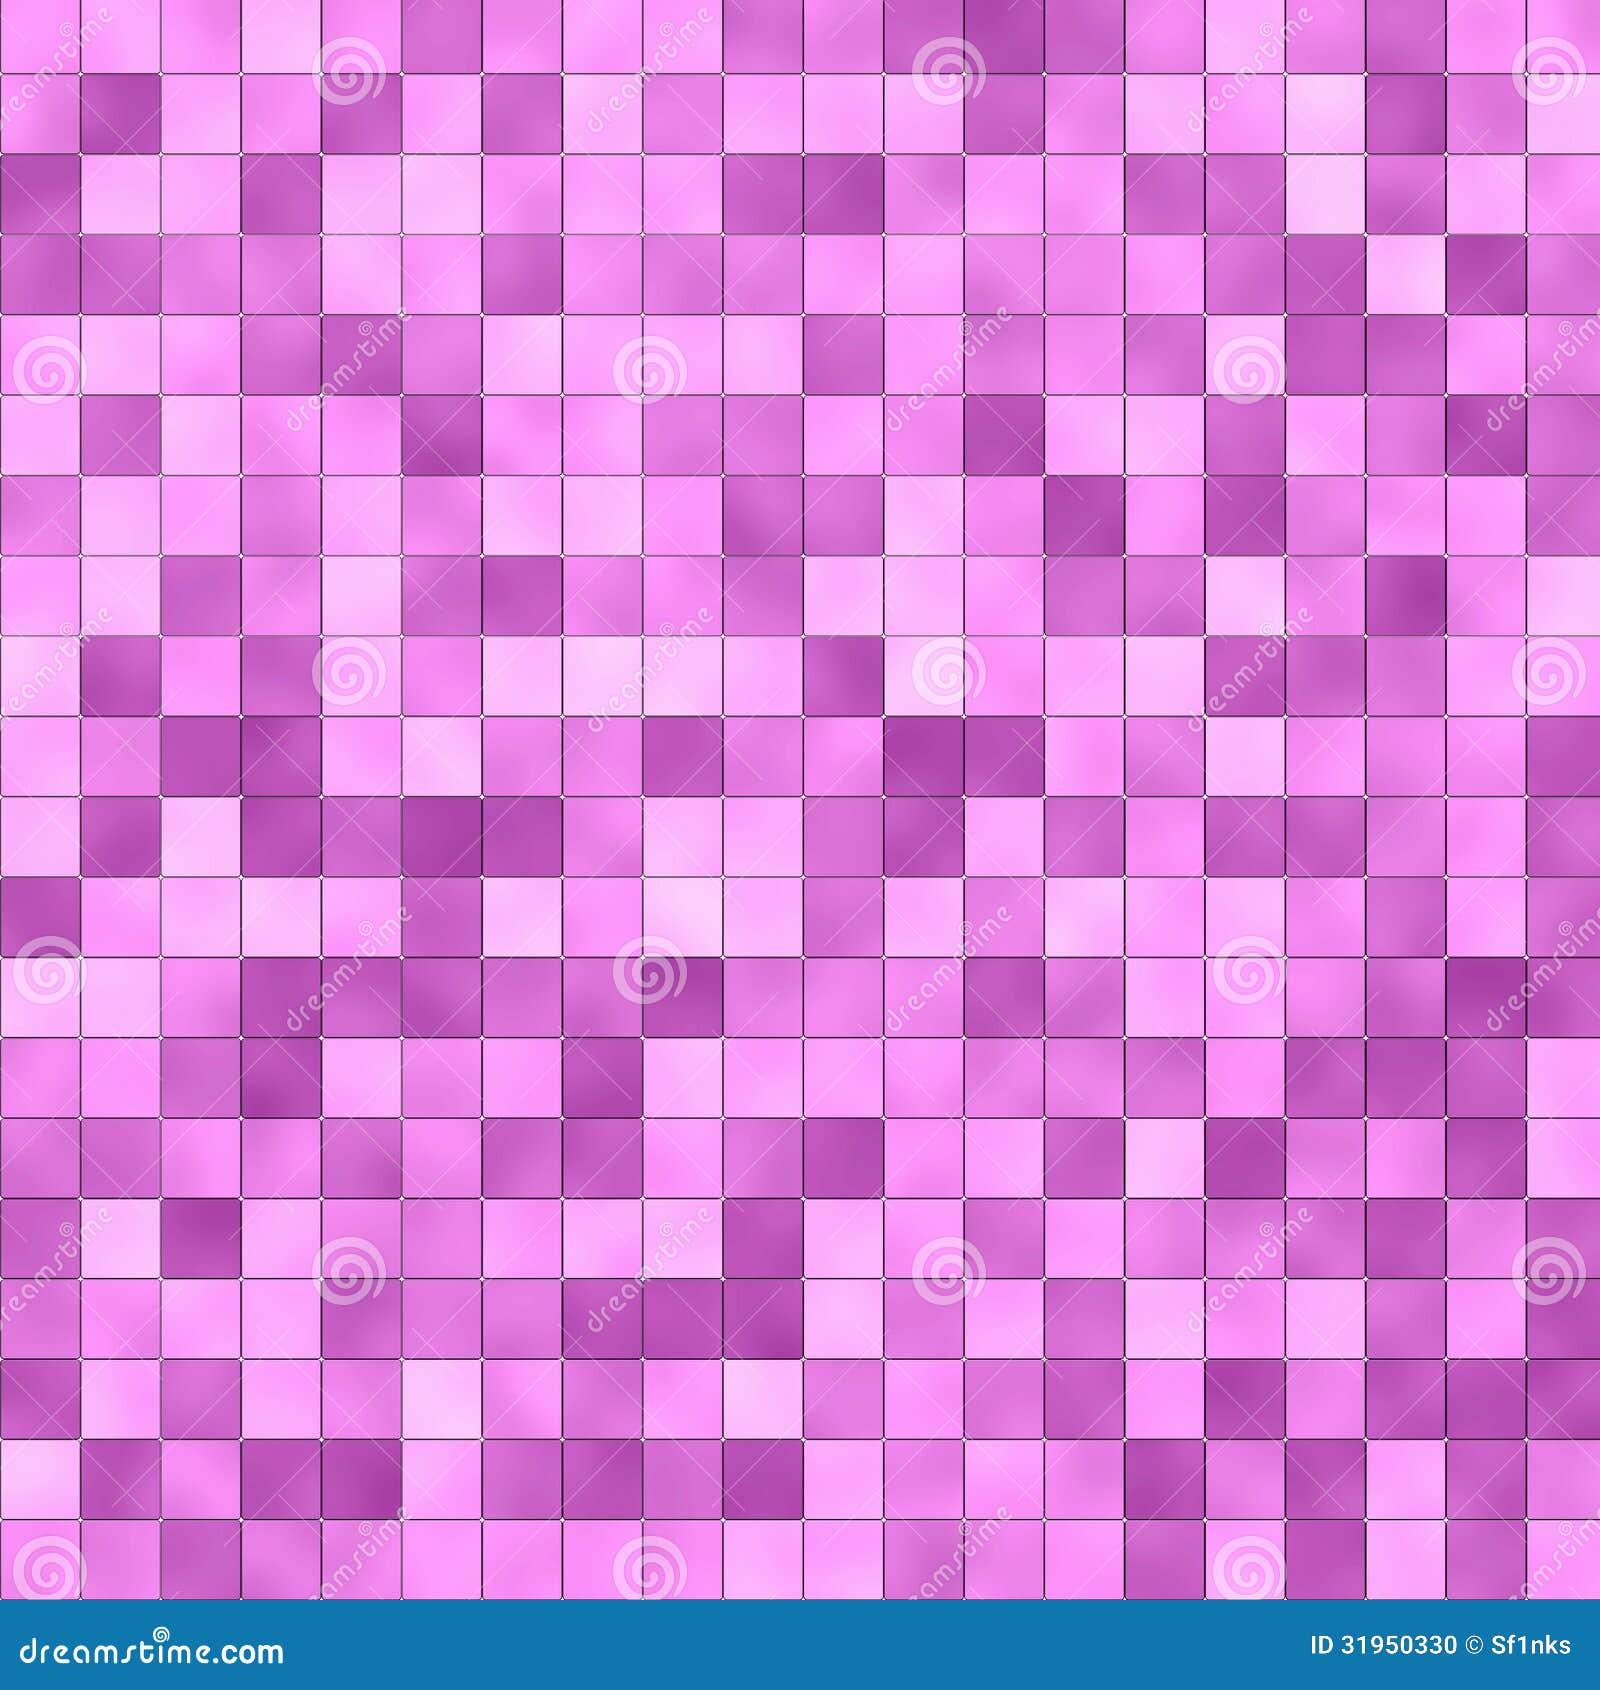 Unique Seamless Pink Tiles Texture Background Kitchen Or Bathroom Concept